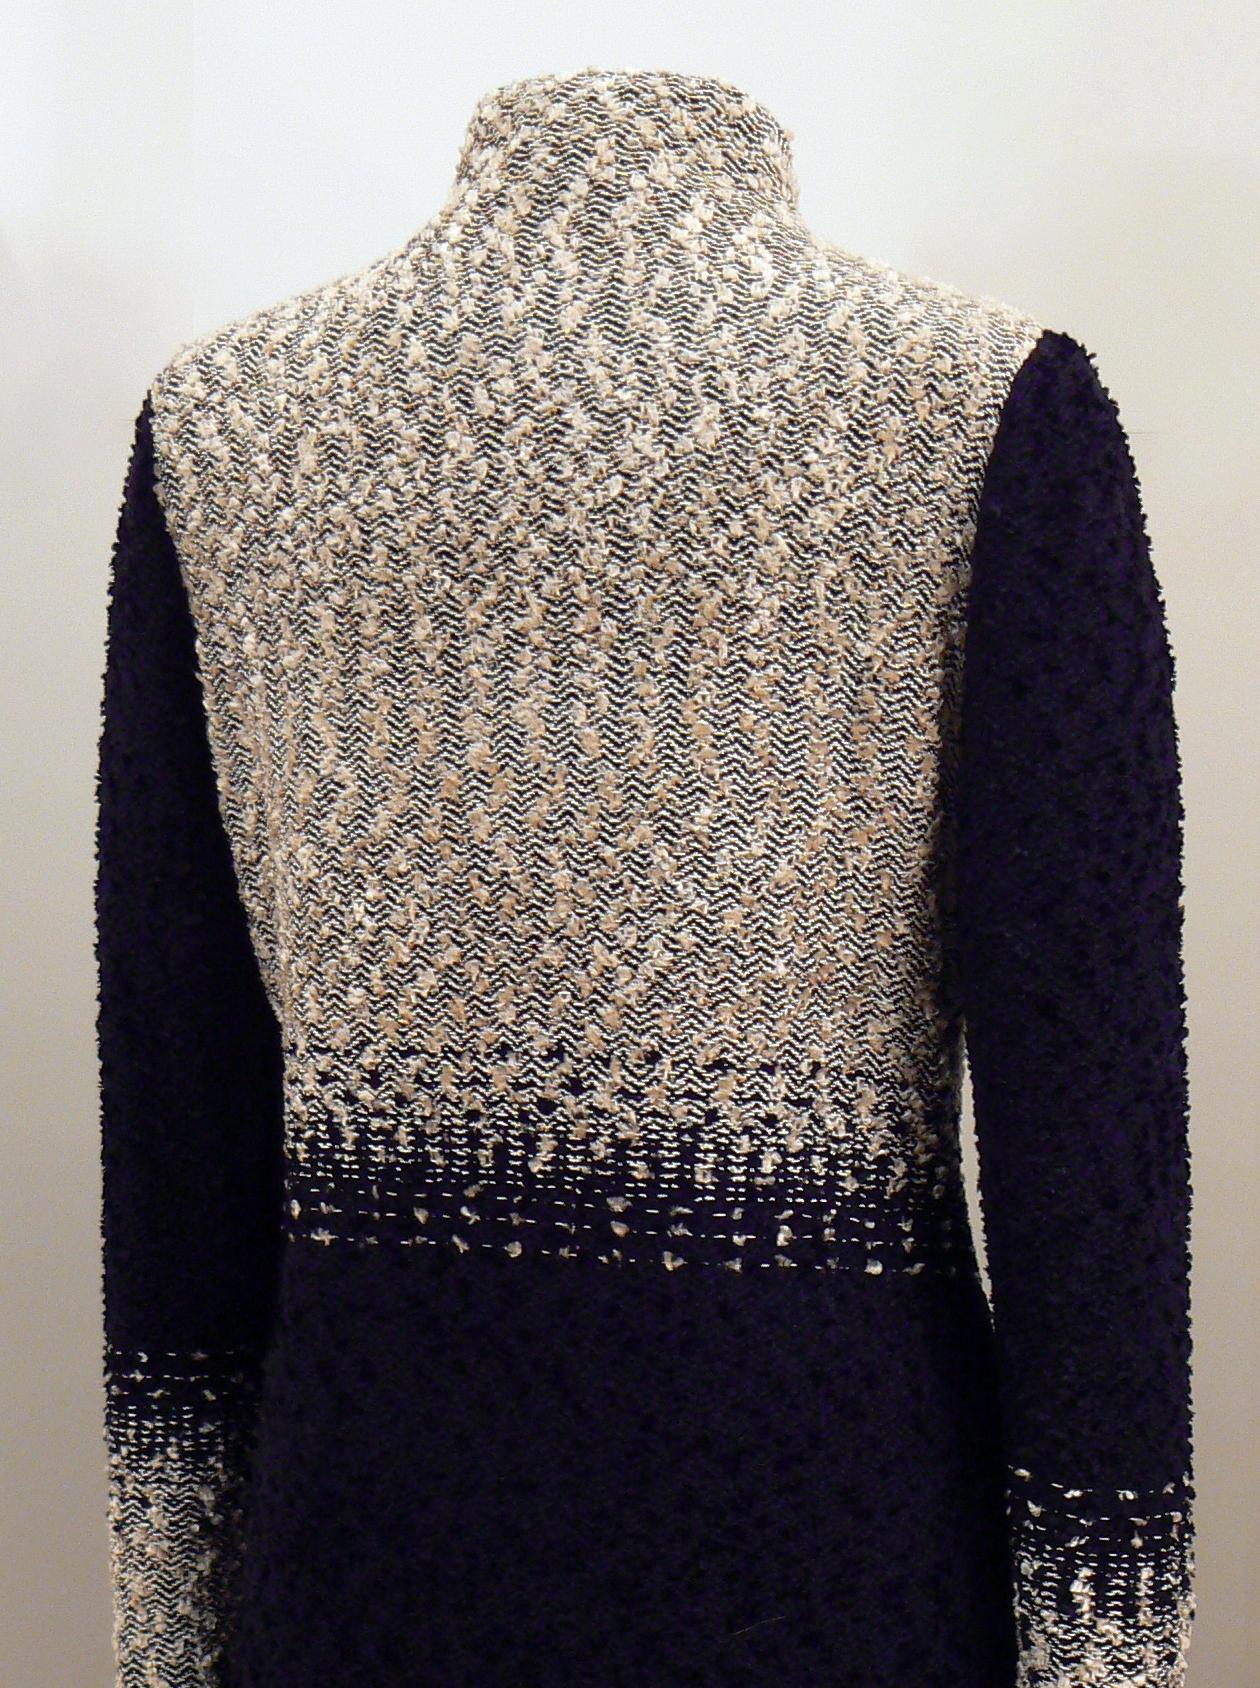 Handwoven Clothing, Coats, Kathleen Weir-West, 9-001.JPG